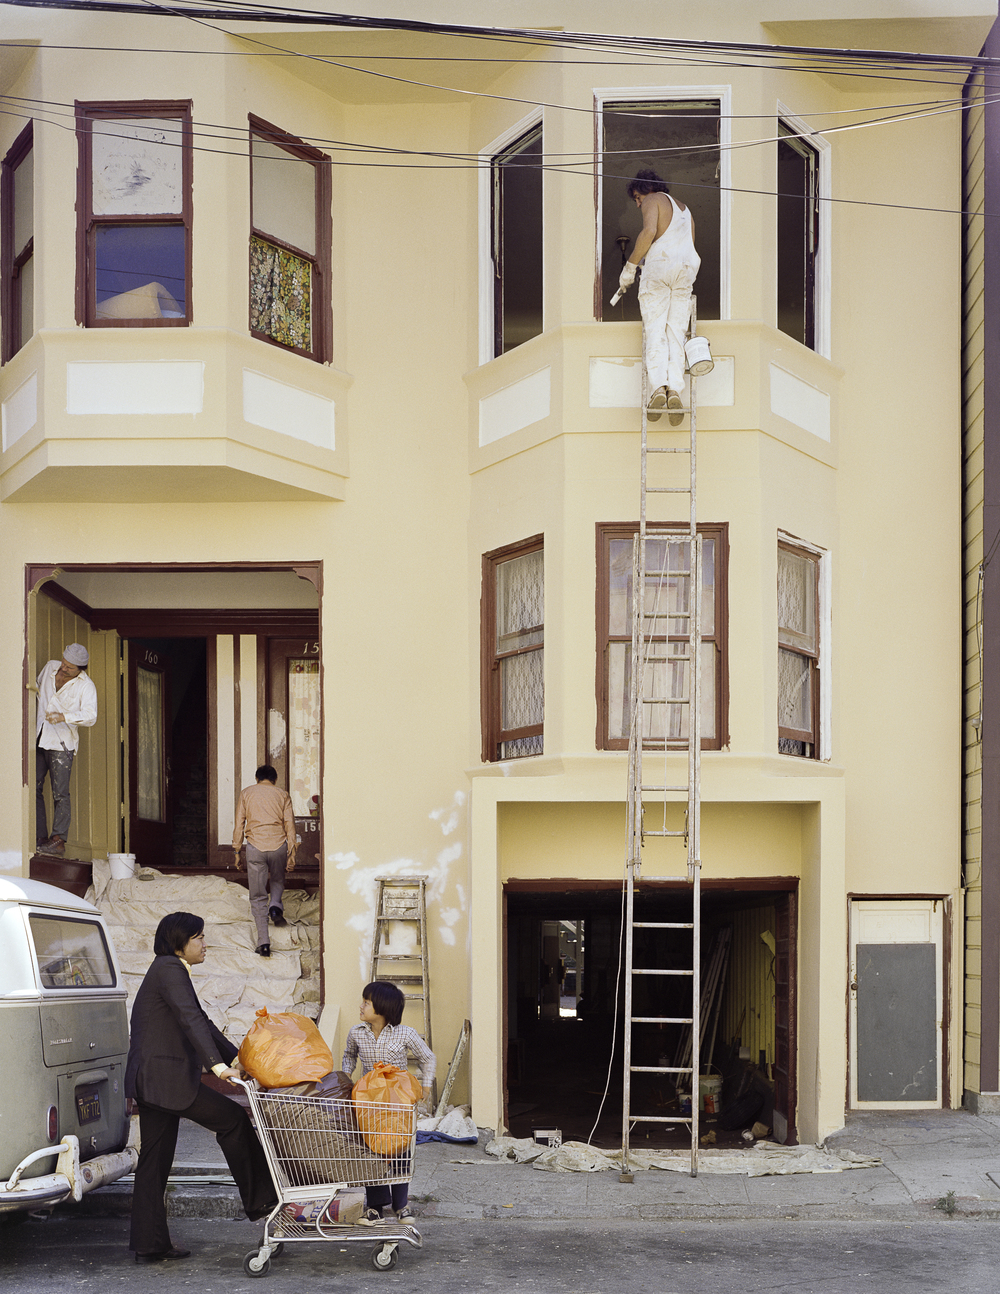 Eviction, 158-160 Langton Street, 1980 Archival Pigment Print, 2016 16 x 20 inches, edition of 5 20 x 24 inches, edition of 2 30 x 40 inches, edition of 2